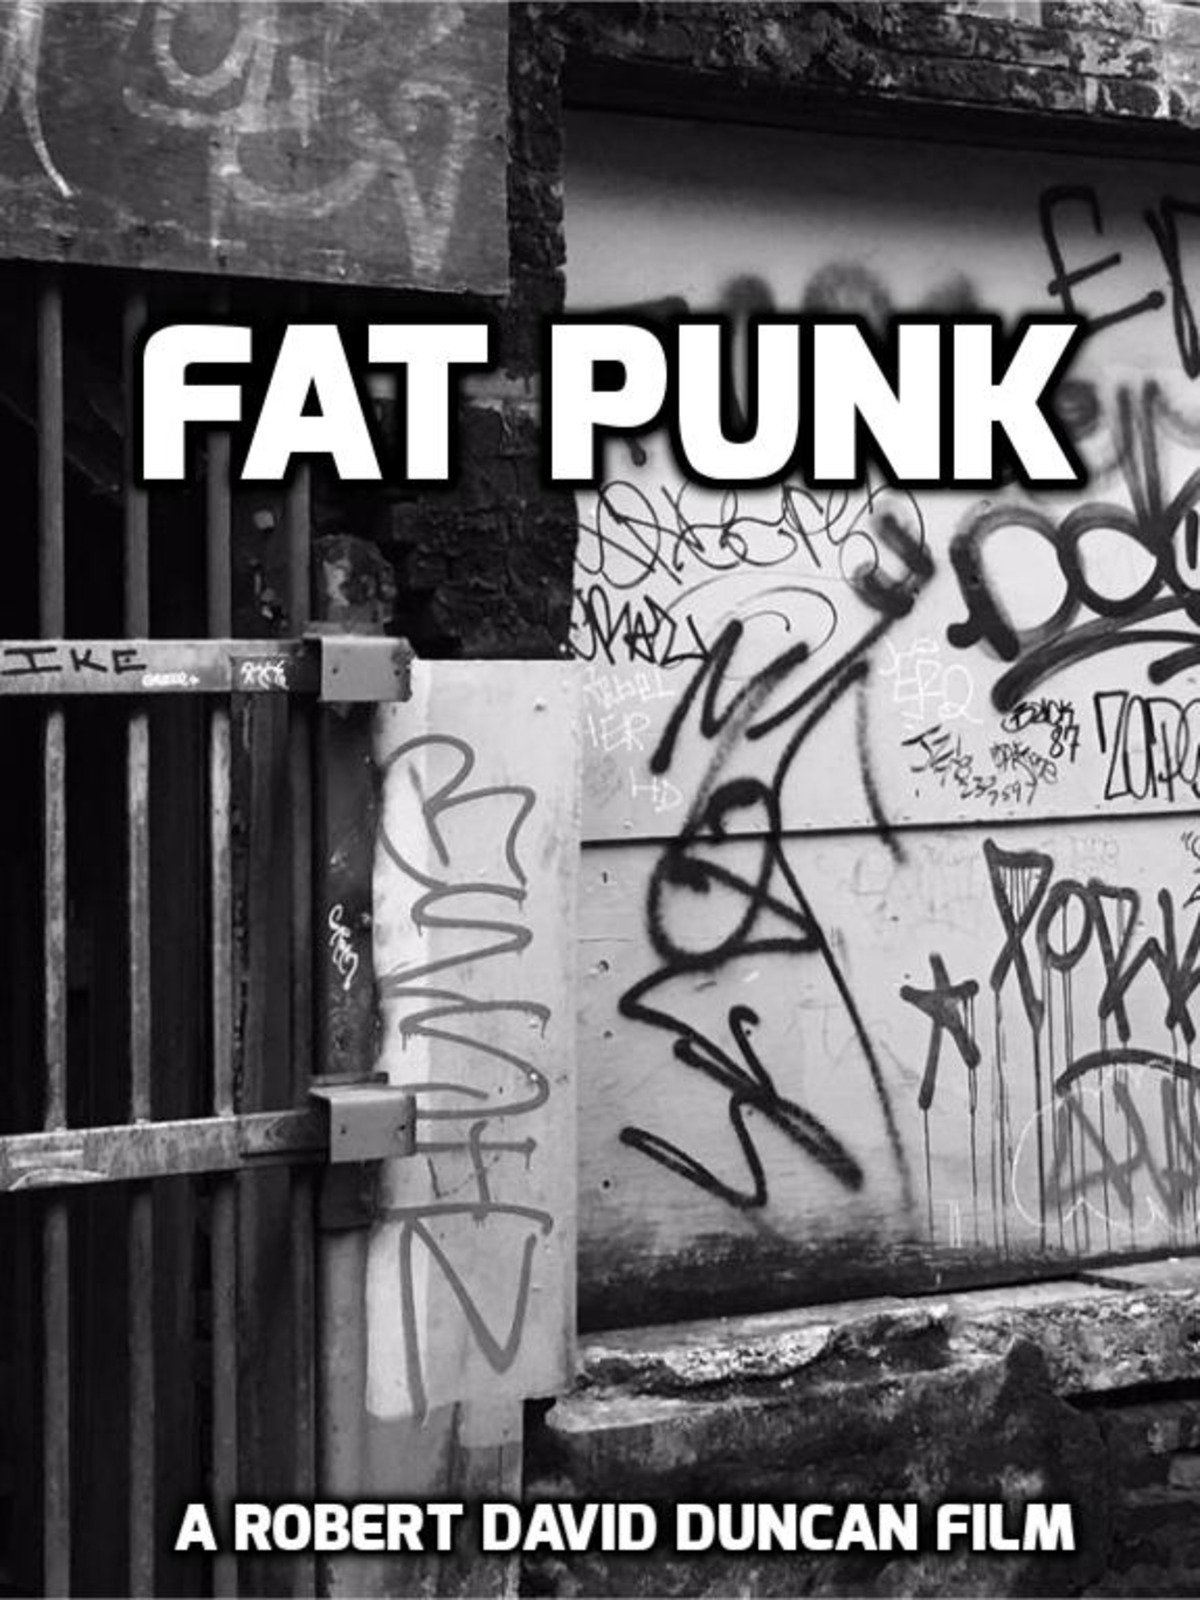 Fat Punk